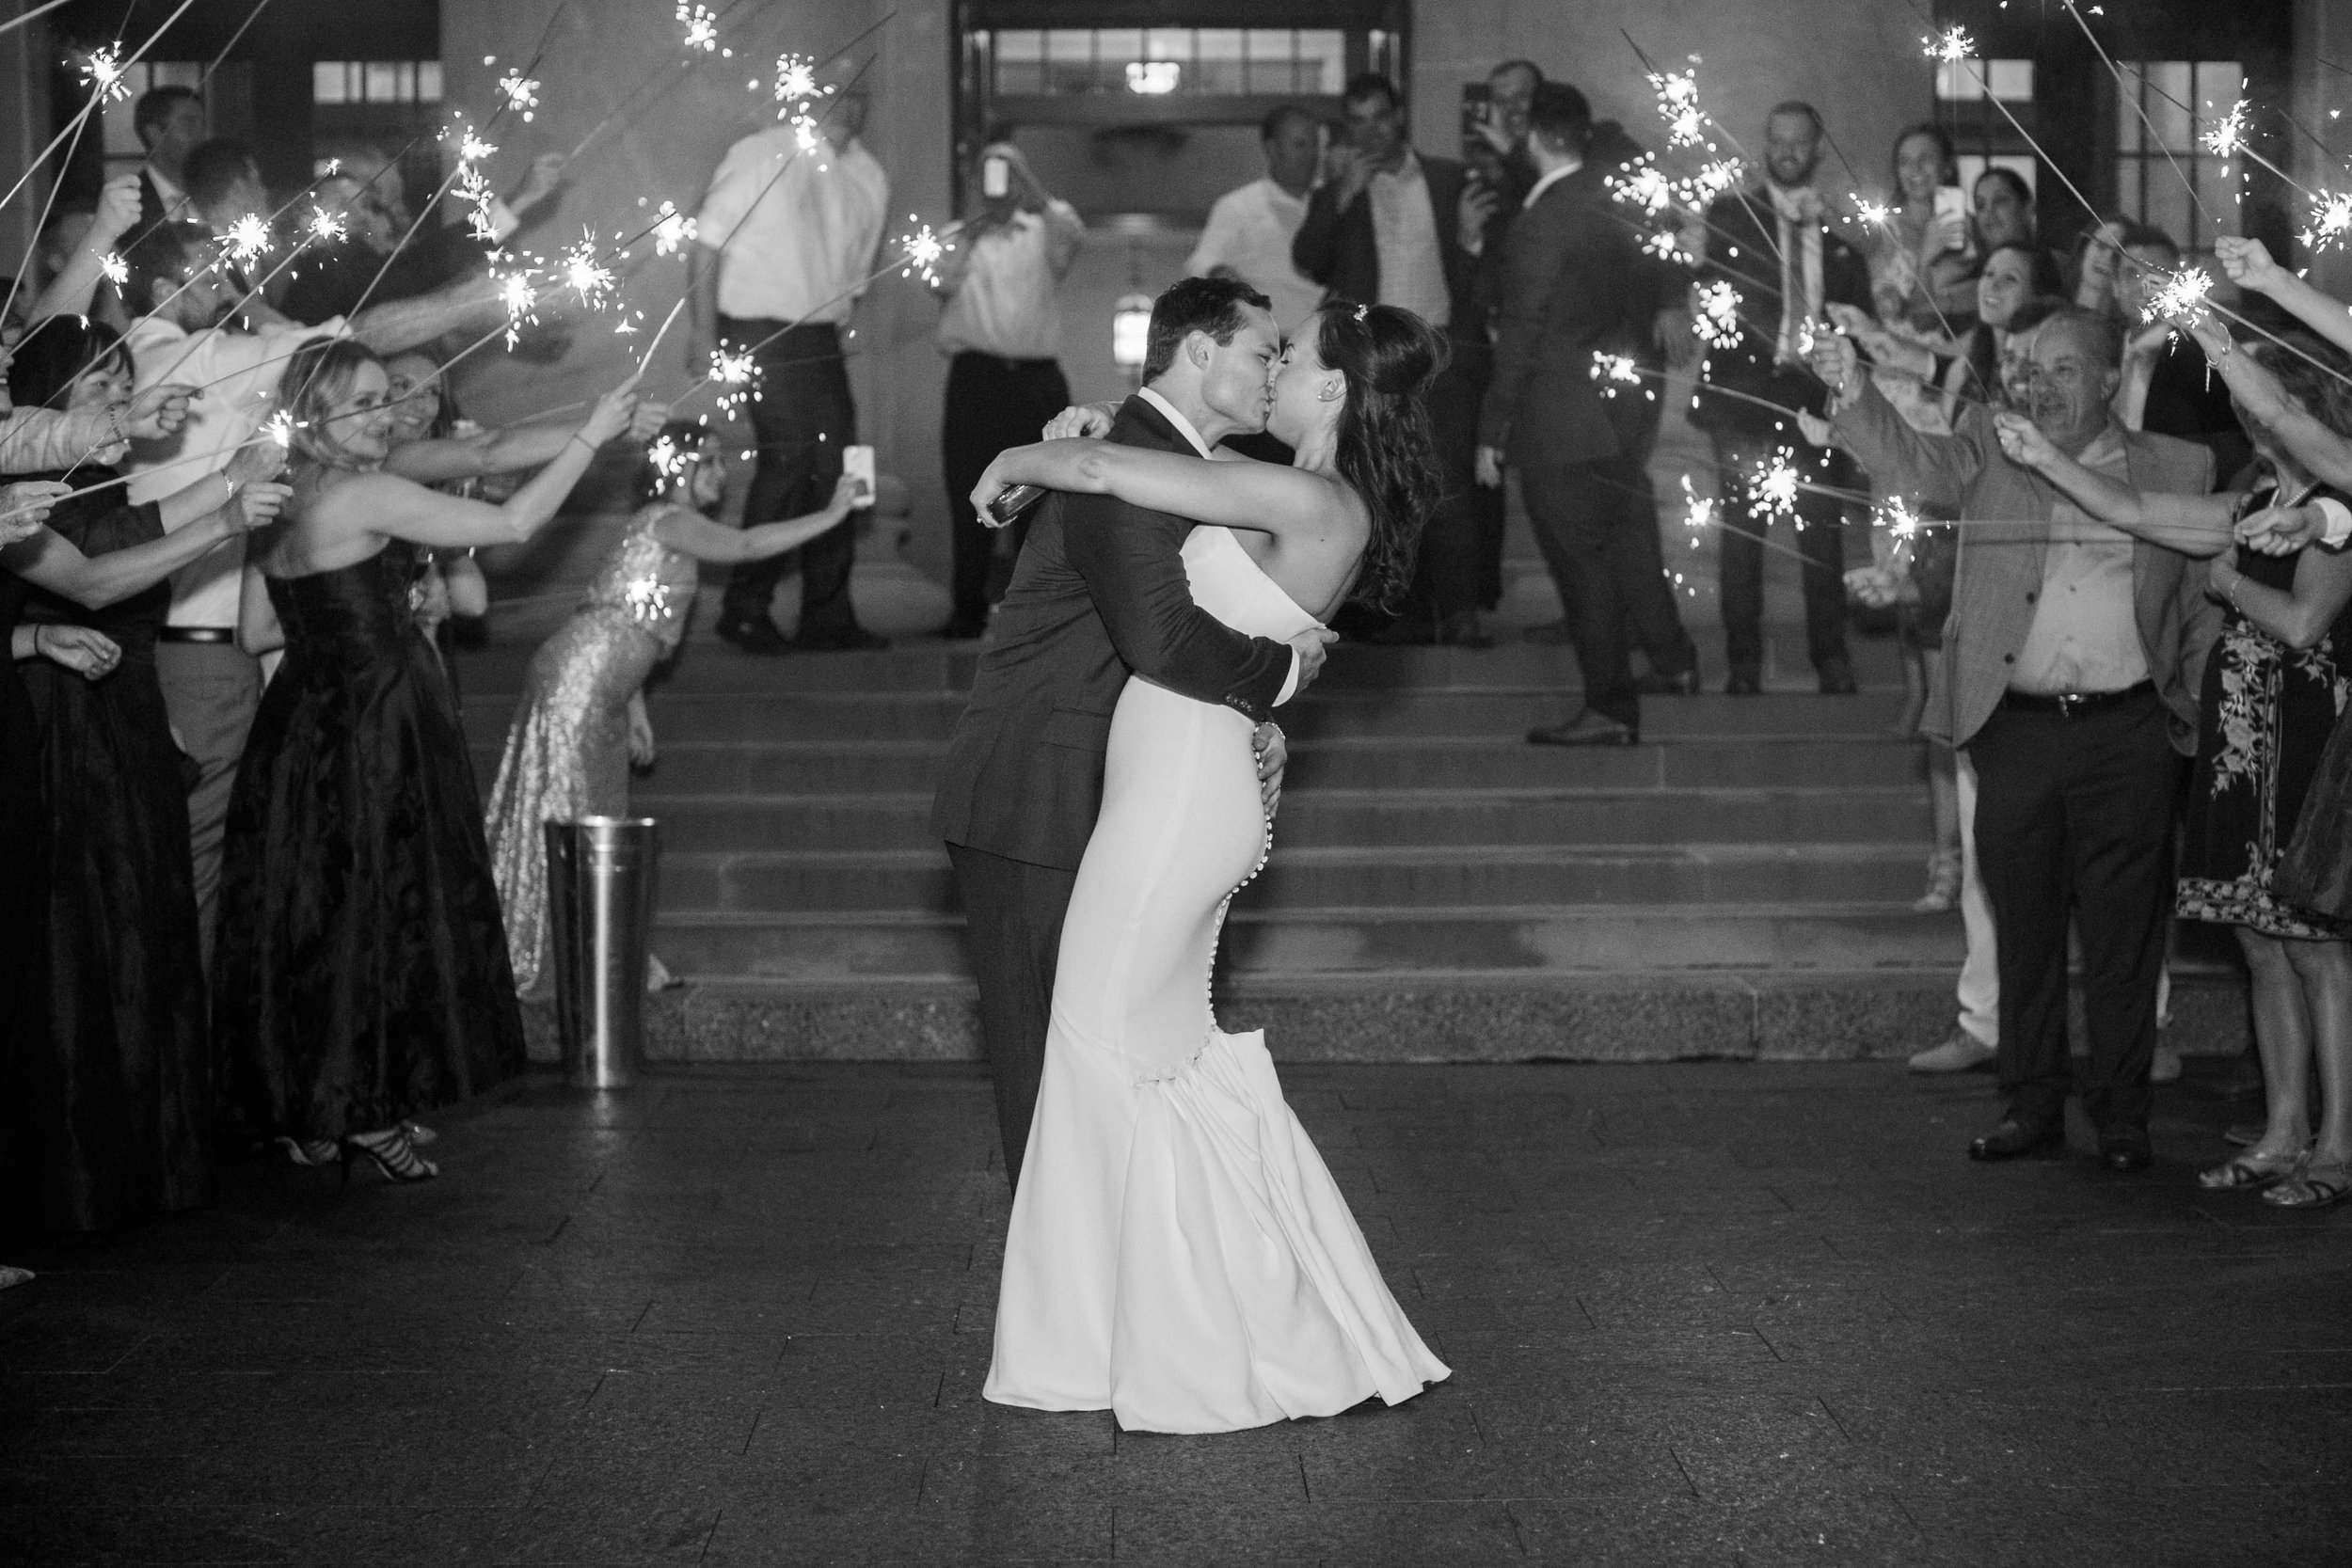 nelson-atkins-wedding-94.jpg